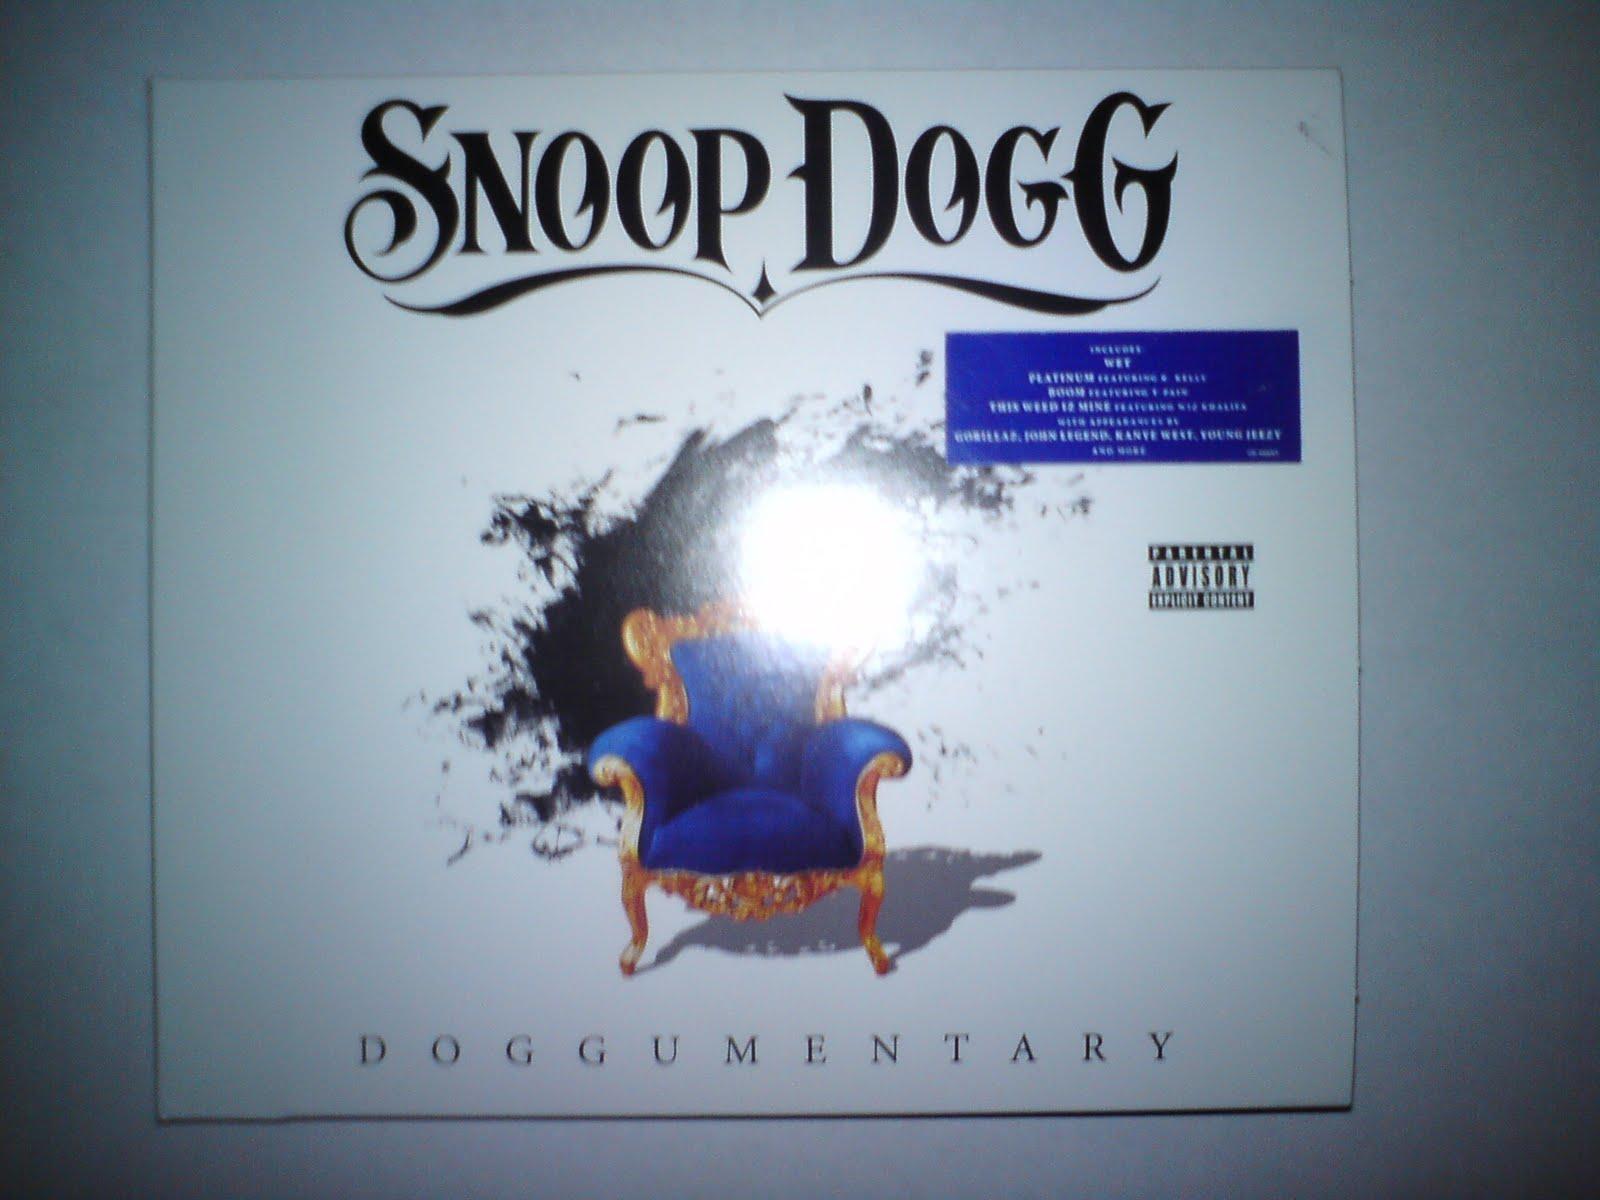 Snoop dogg doggumentary - photo#3